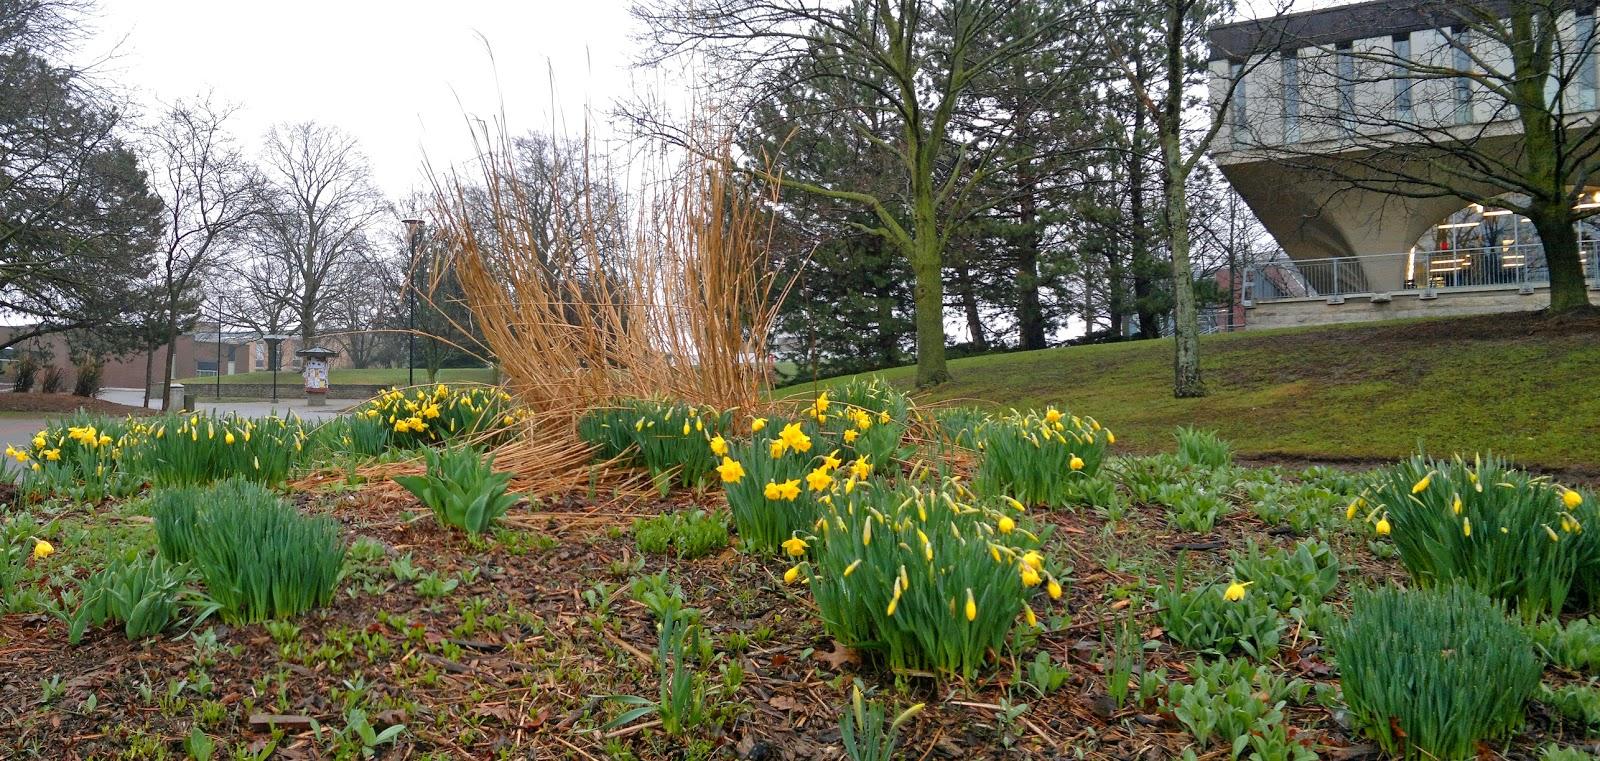 Daffodils near the Dana Porter Library at the University of Waterloo. Credit: George Freeman